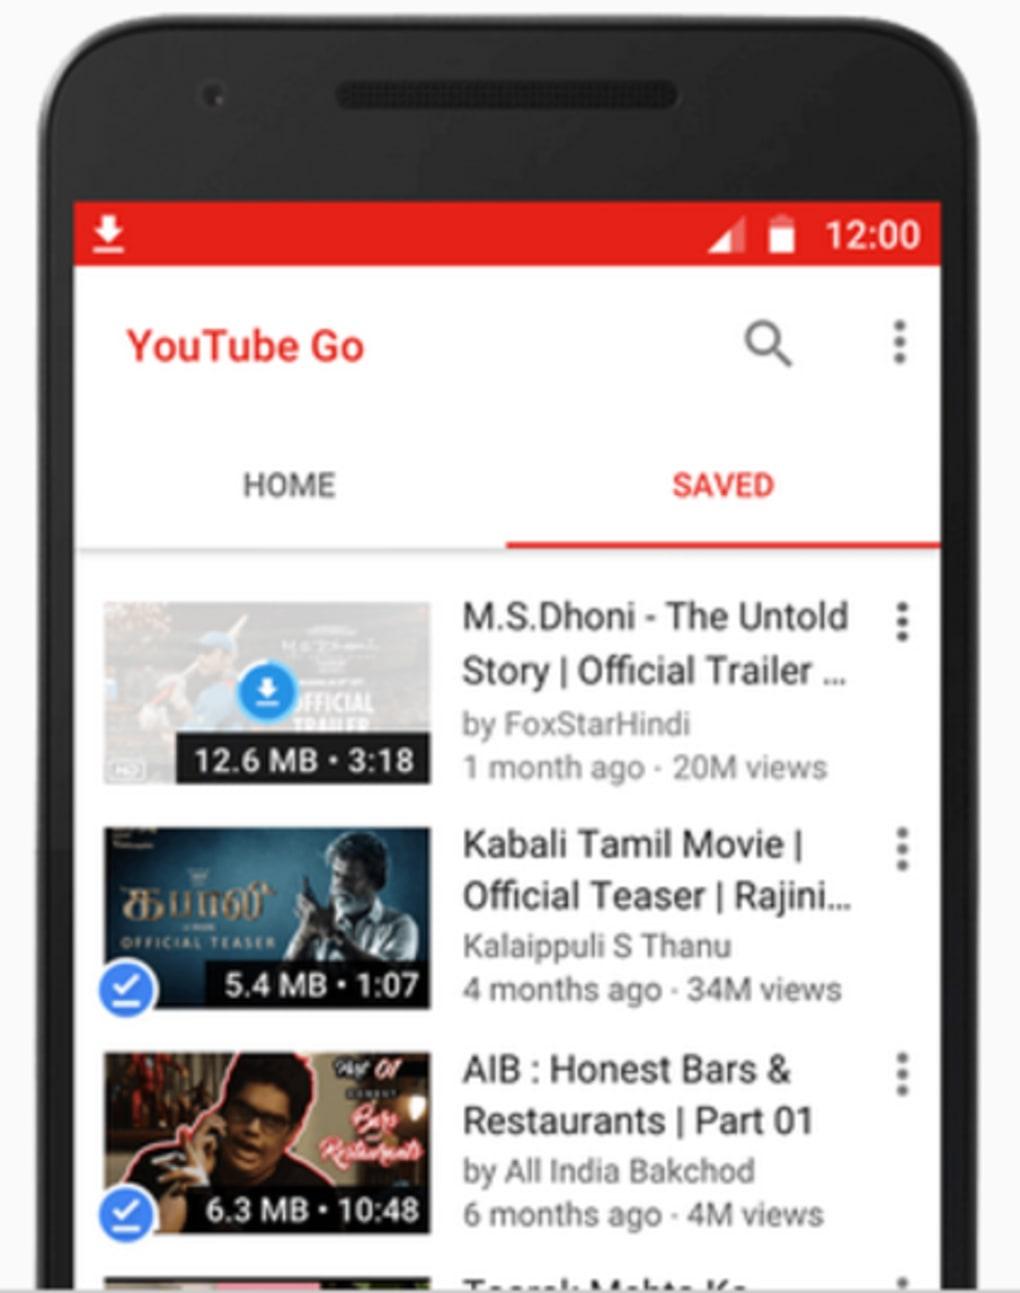 cara download youtube go di iphone 5